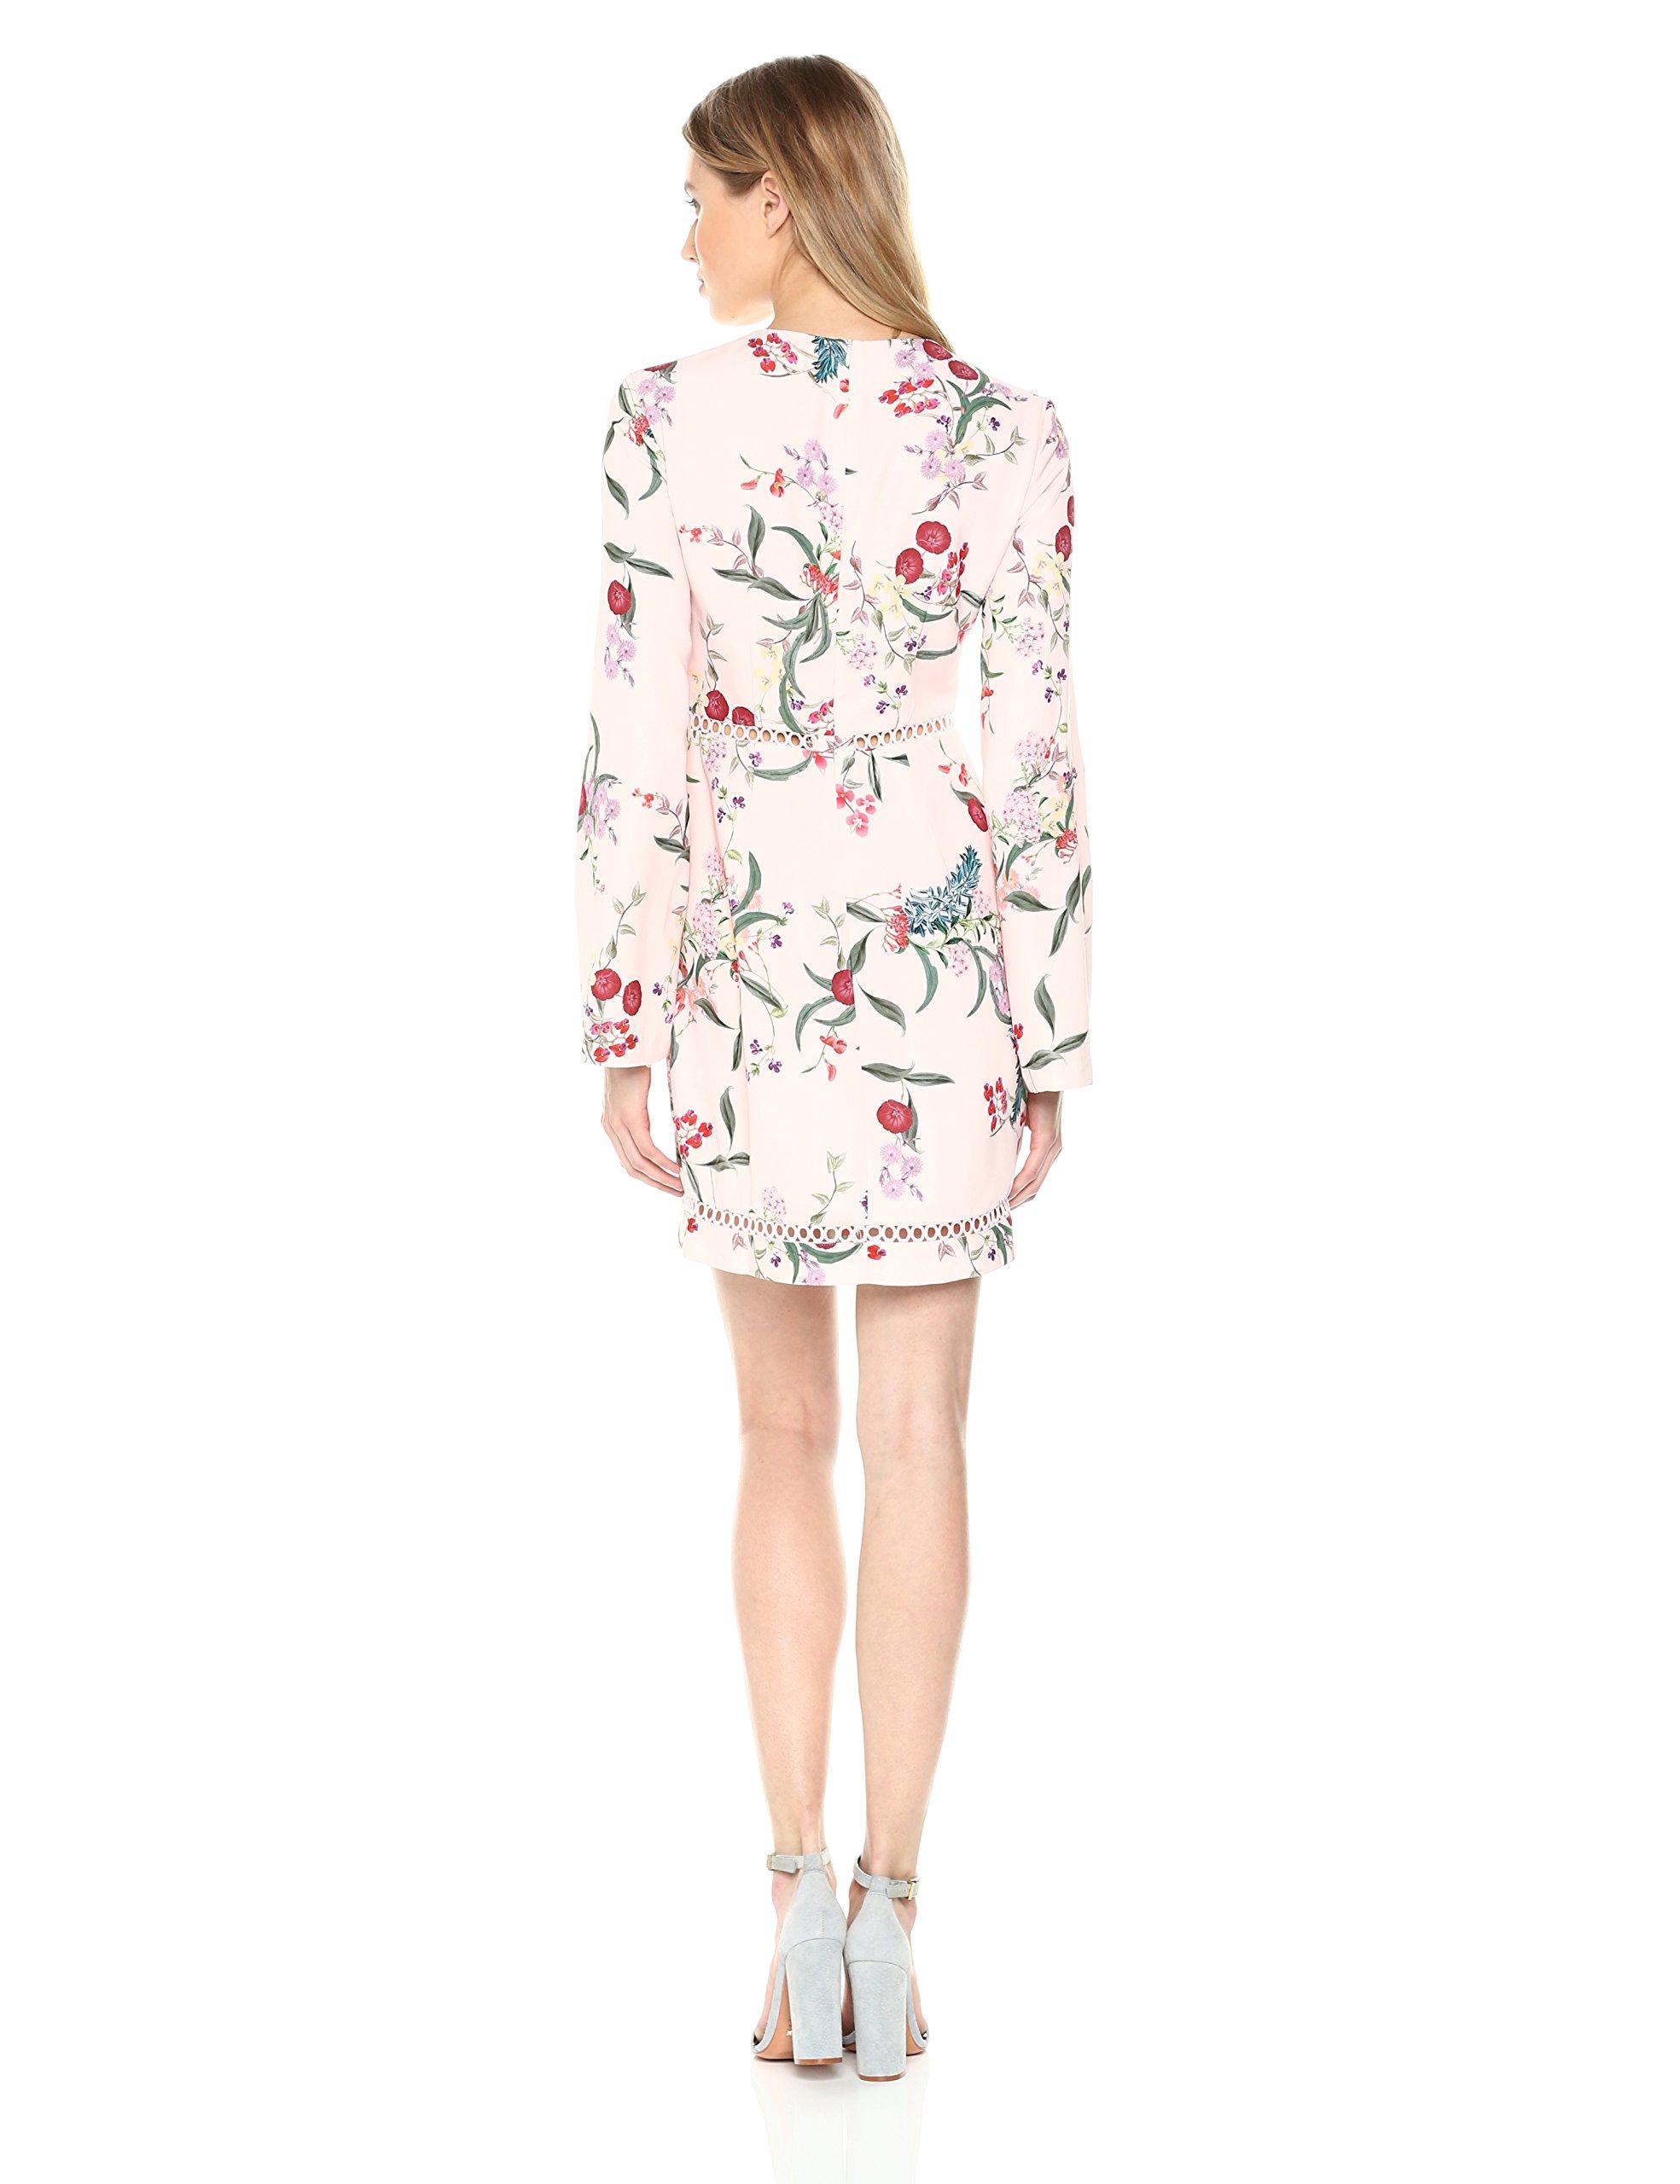 Keepsake The Label Women's Indulge LS Mini Dress, Blush Botanic Floral, S by Keepsake The Label (Image #2)